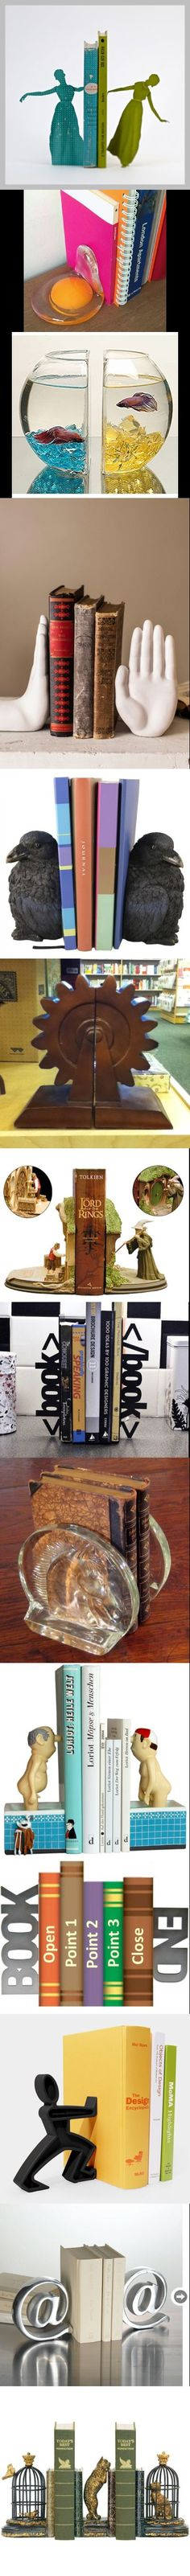 Bookend..... visit: http://pinterest.com/okknihovna/bookend-zar%C3%A1%C5%BEky-na-knihy/